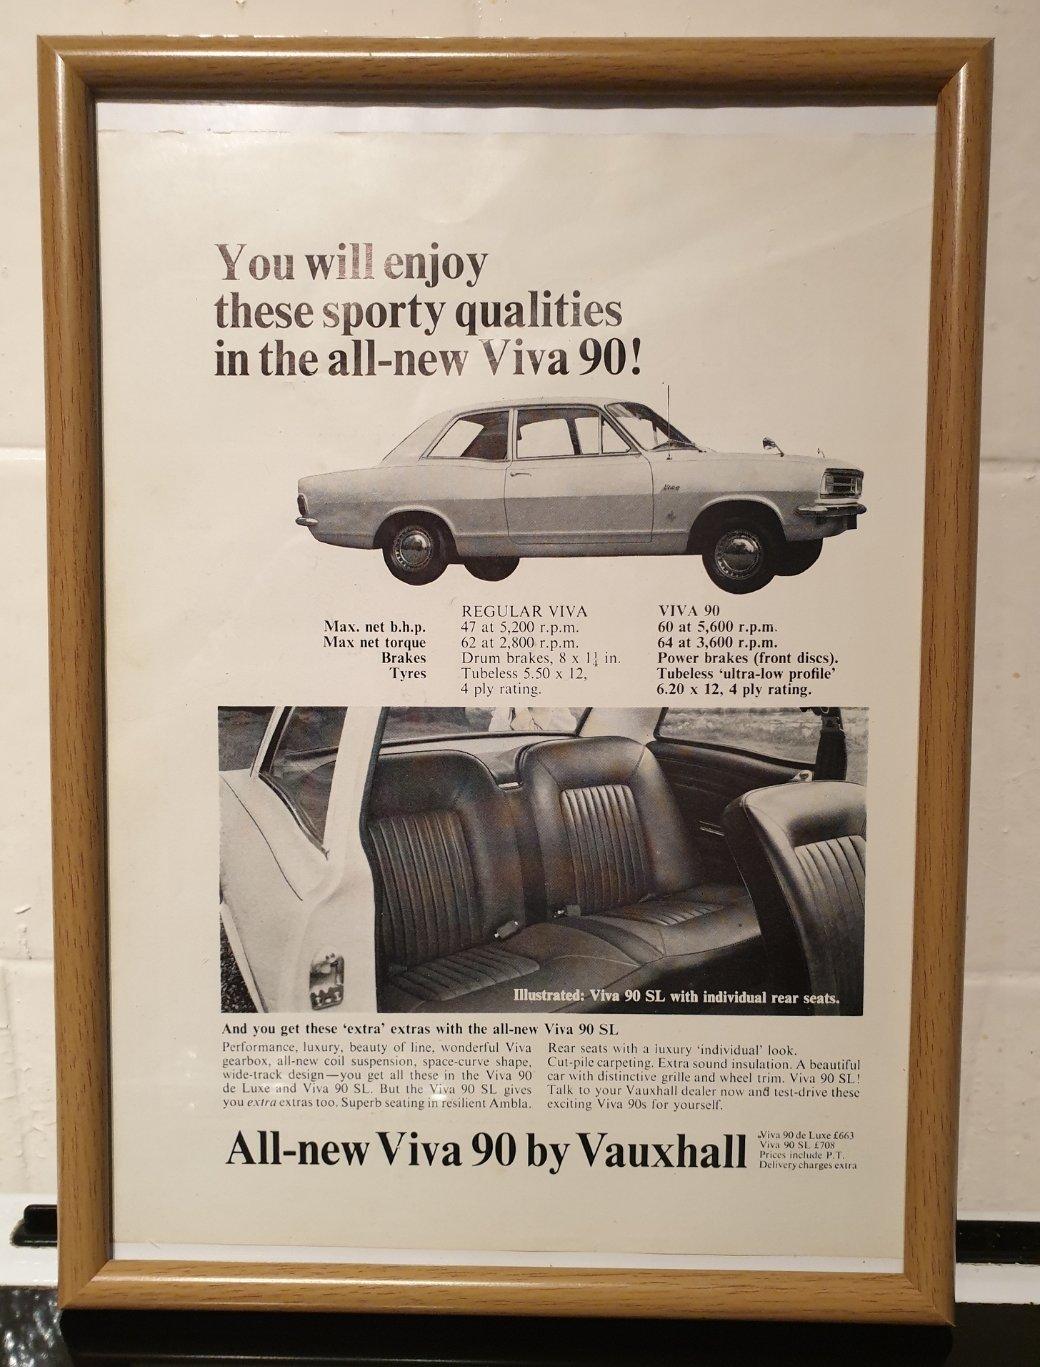 1967 Vauxhall Viva 90 Framed Advert Original  For Sale (picture 1 of 2)